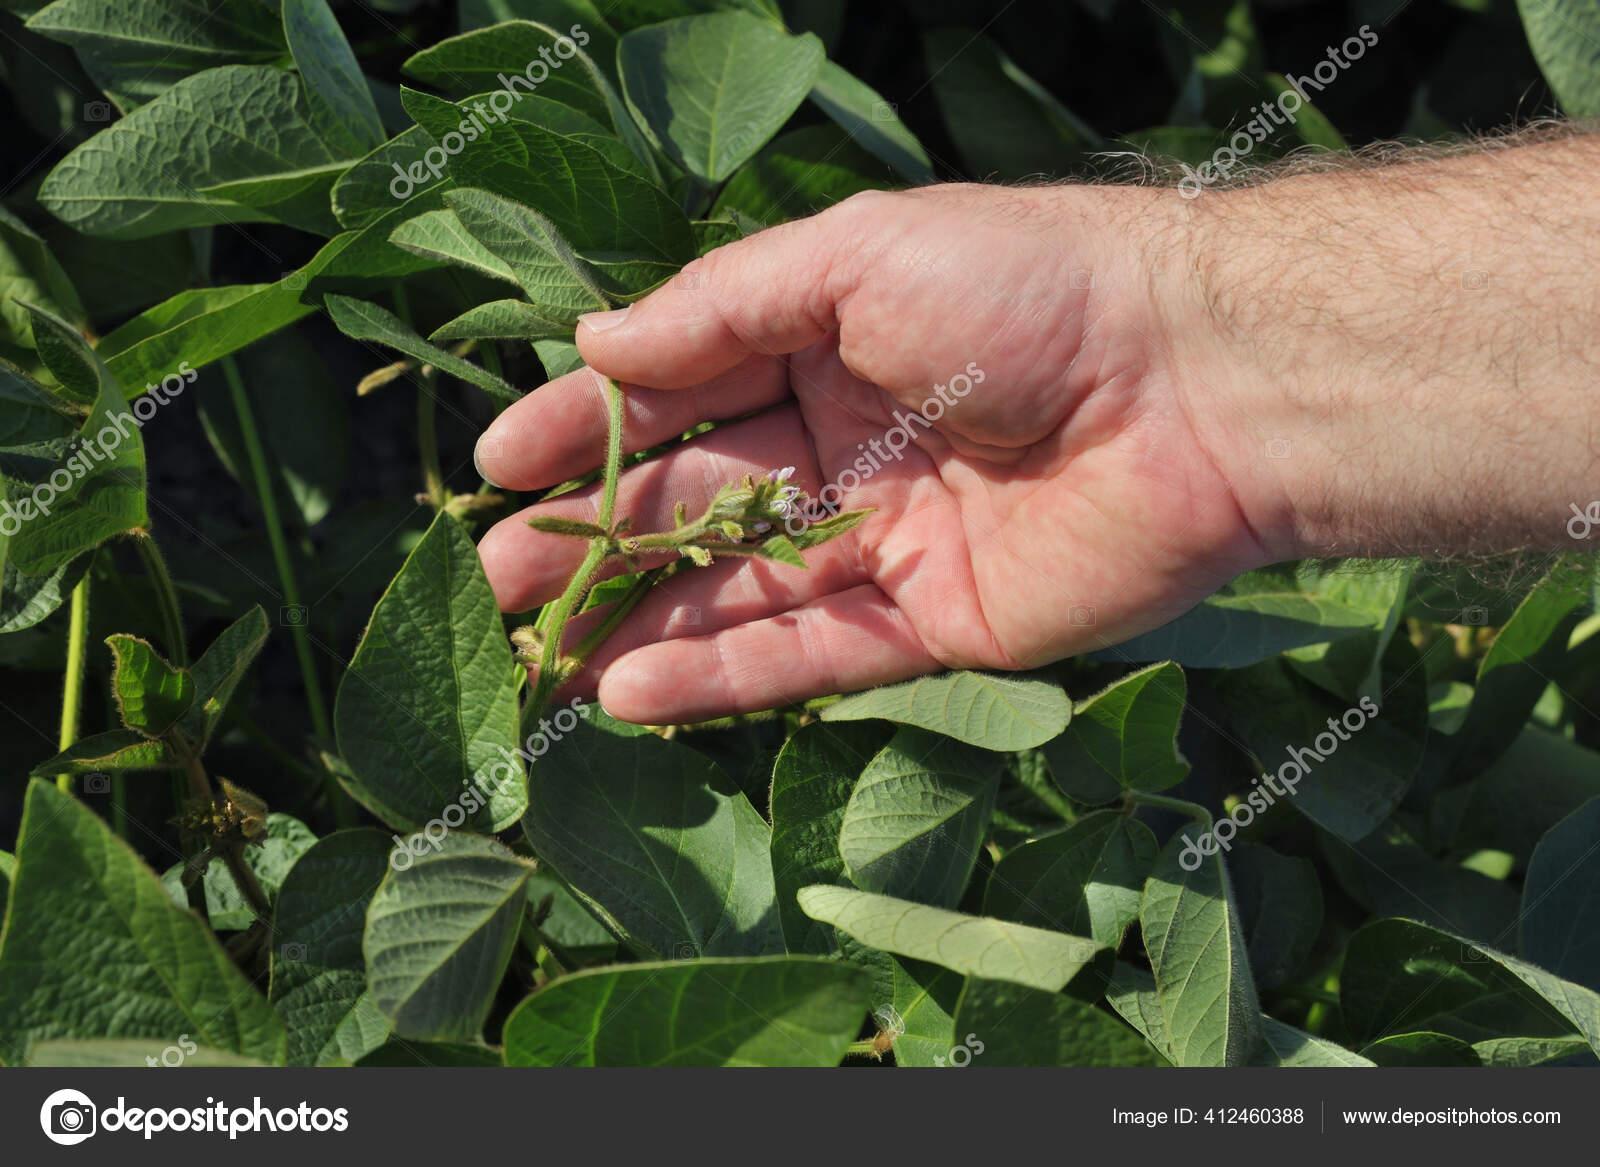 Petani Atau Agronomis Memeriksa Tanaman Kedelai Hijau Lapangan Dekat Tangan Stok Foto C Simazoran 412460388